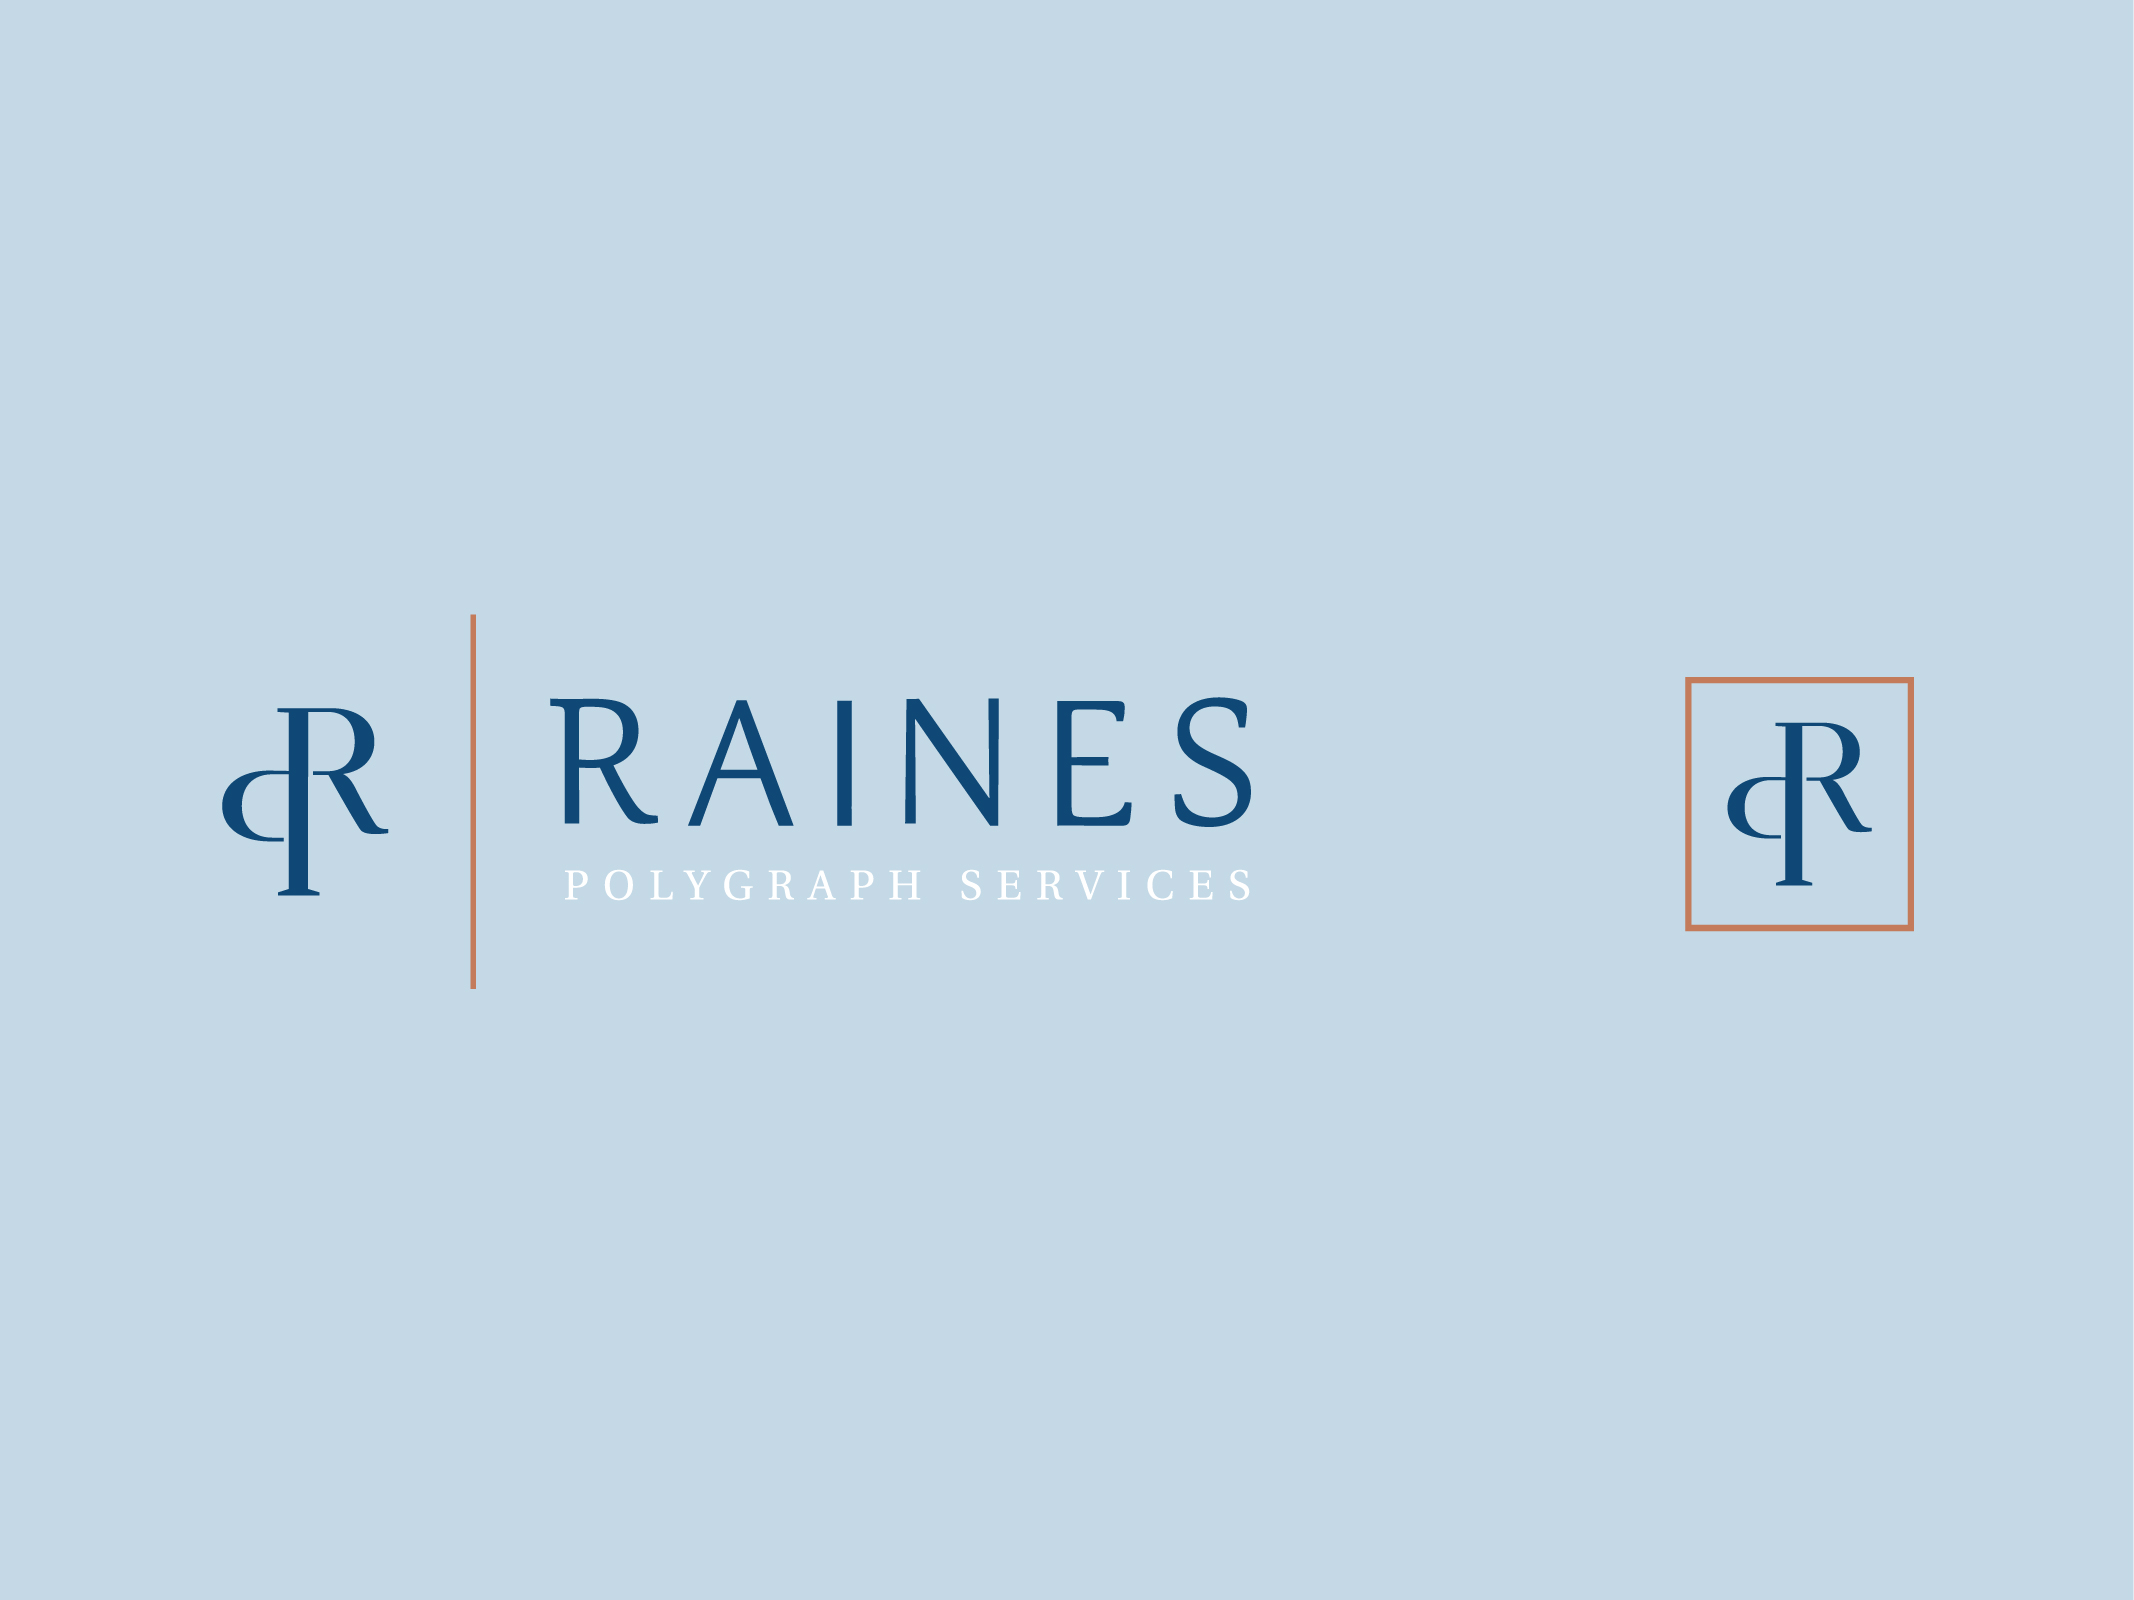 Raines-HBWebsite-Graphic-01.jpg